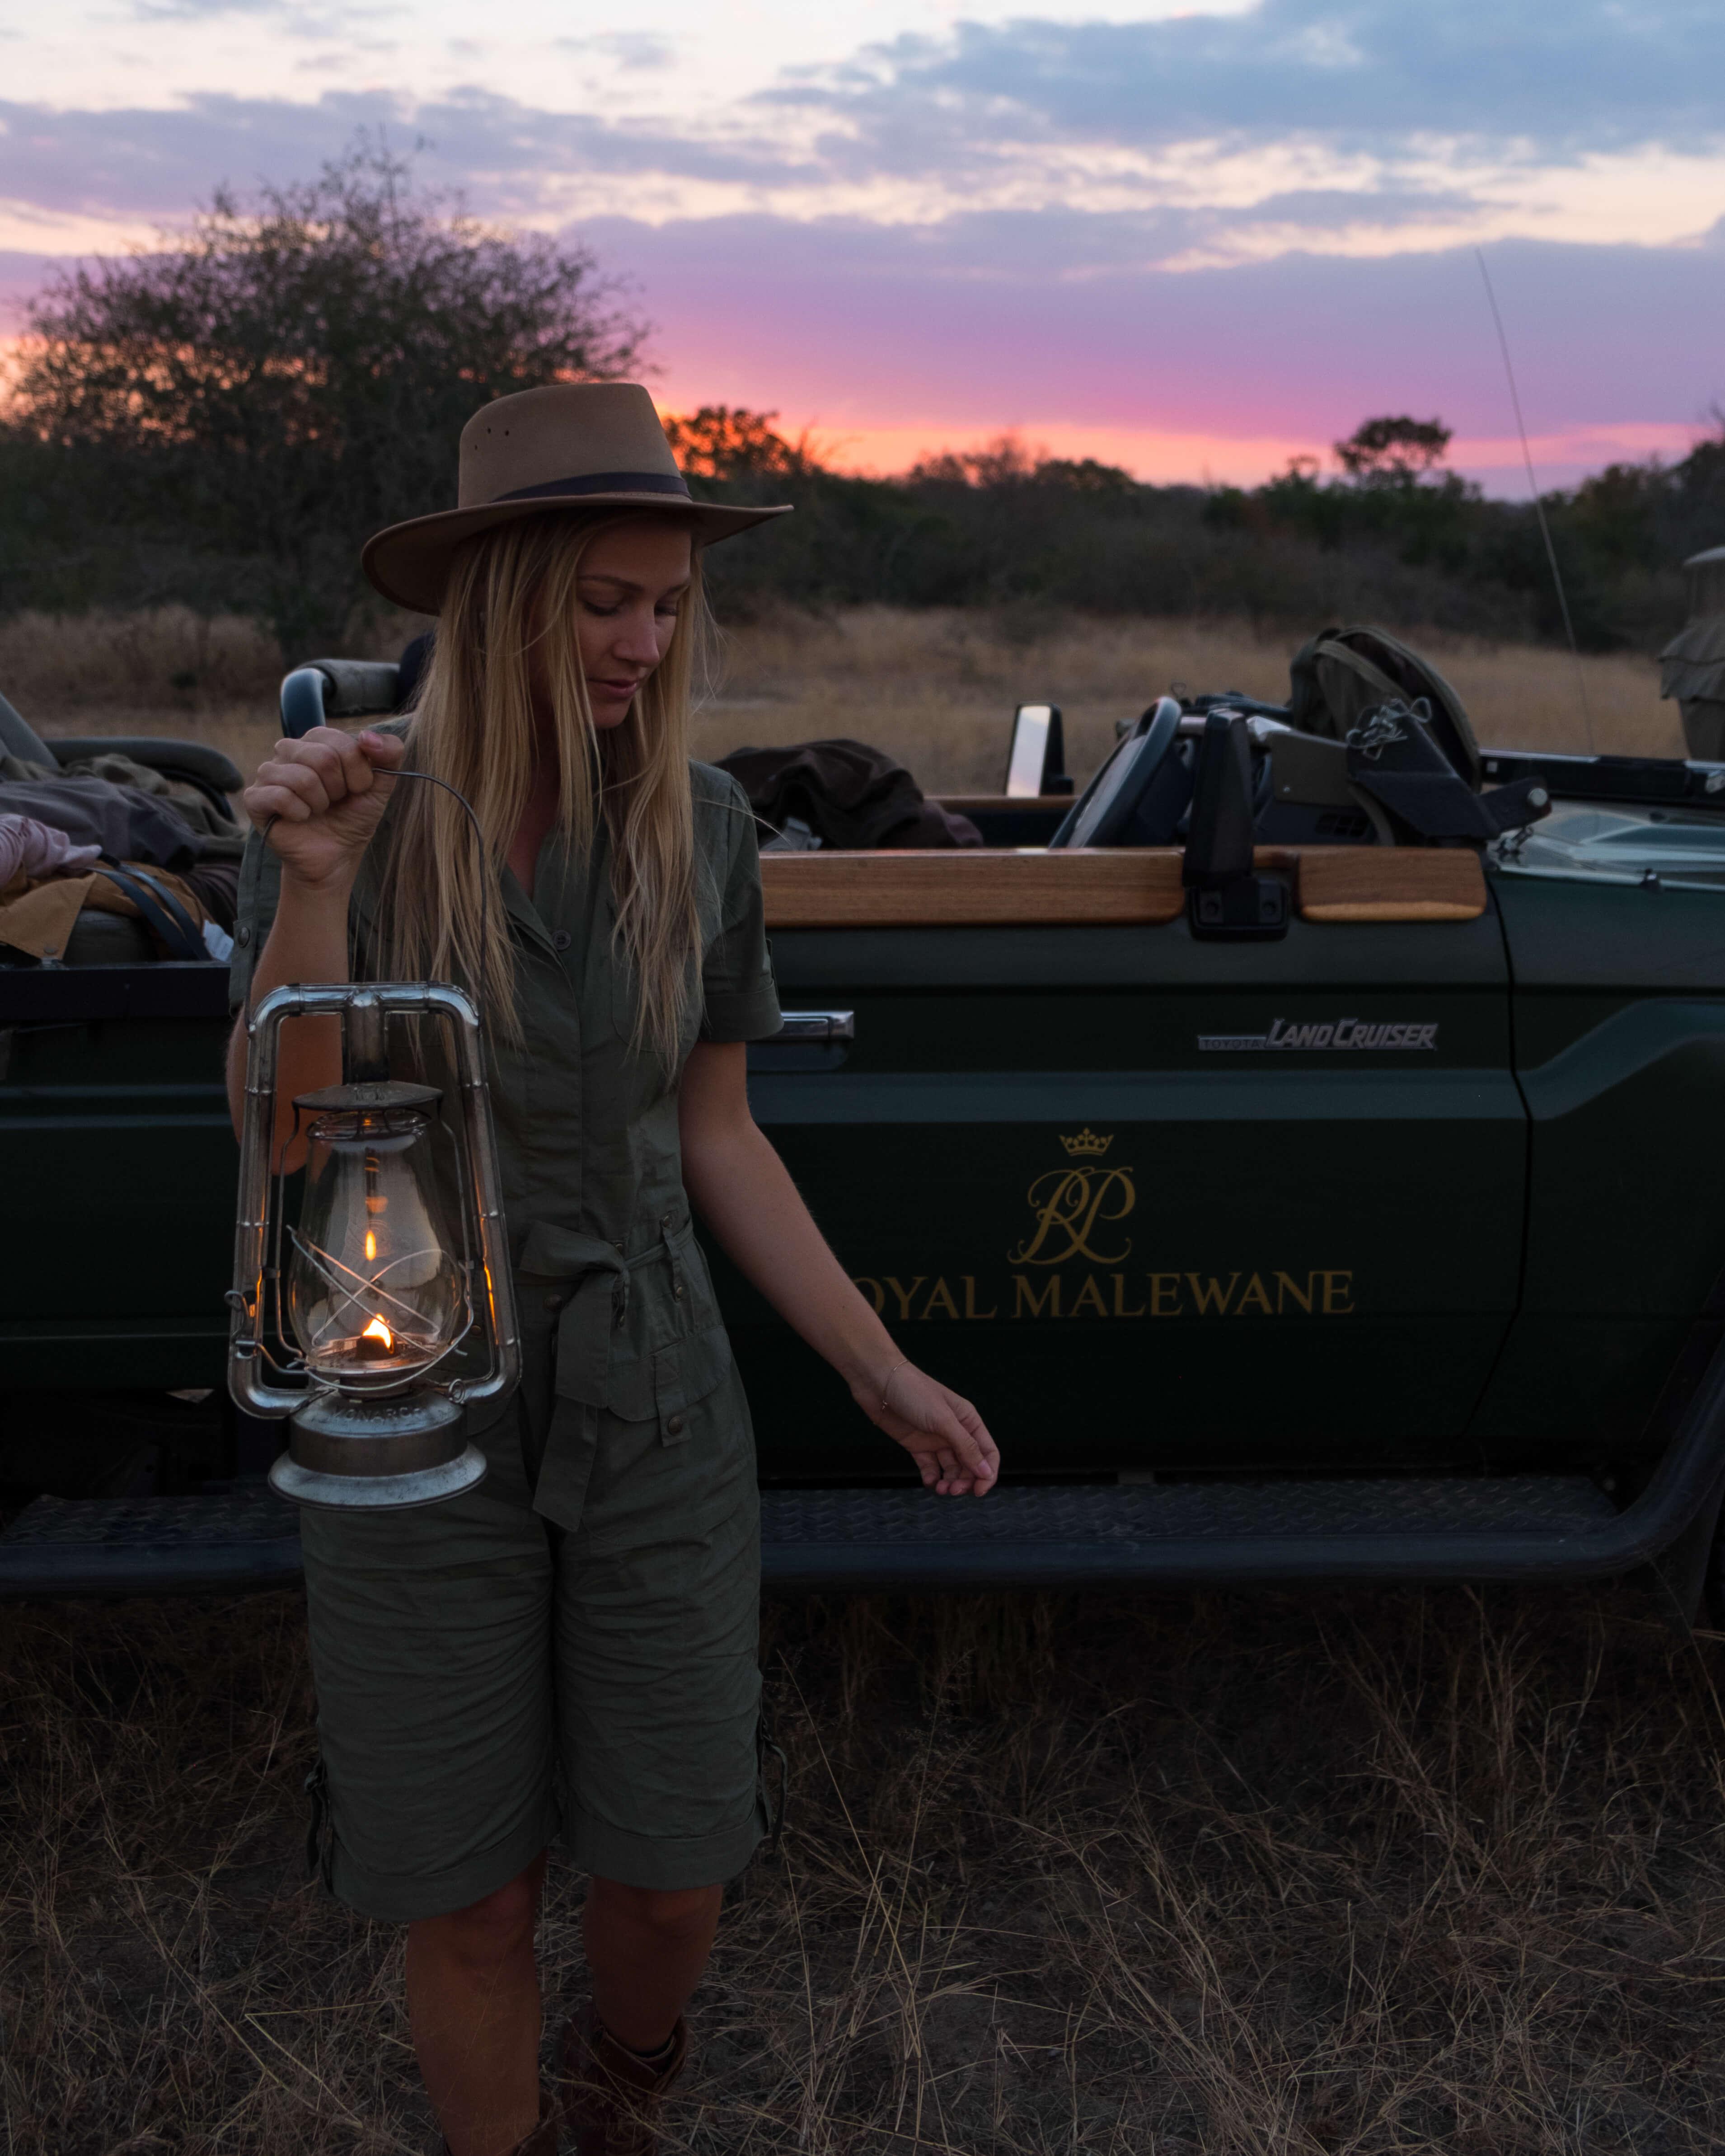 Royal Malewane Night Safari